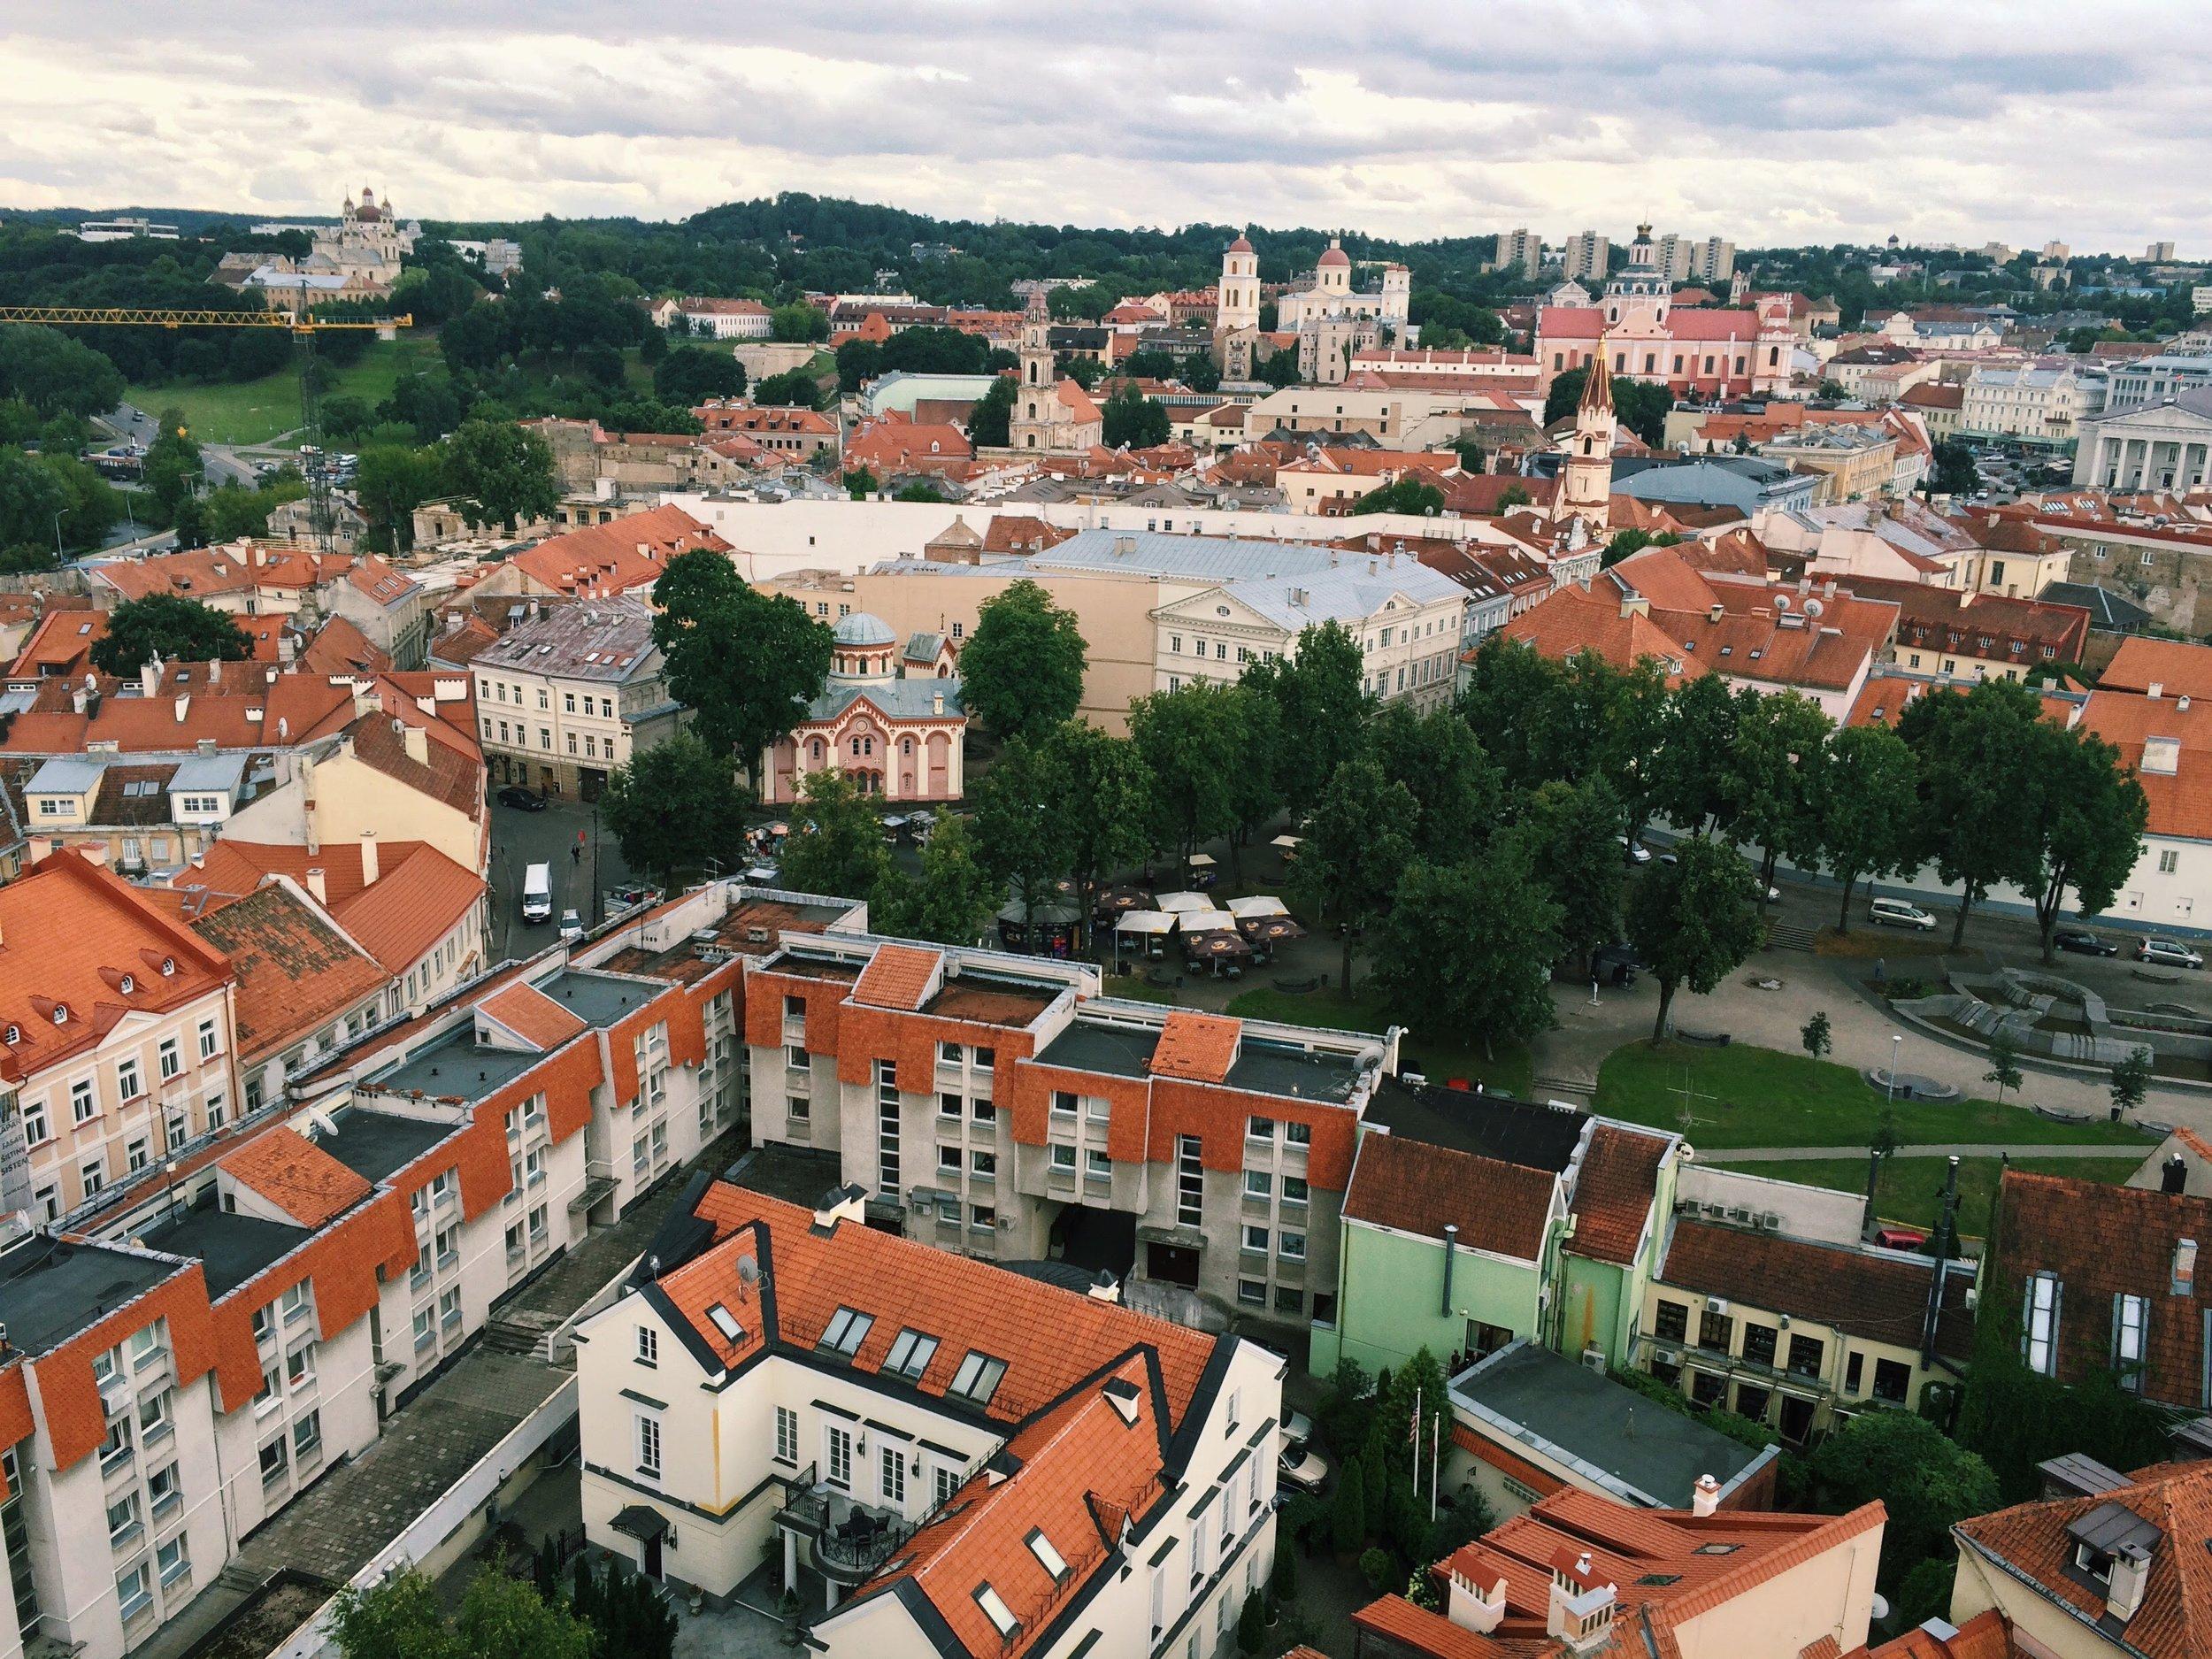 Aerial view of Old Vilnius